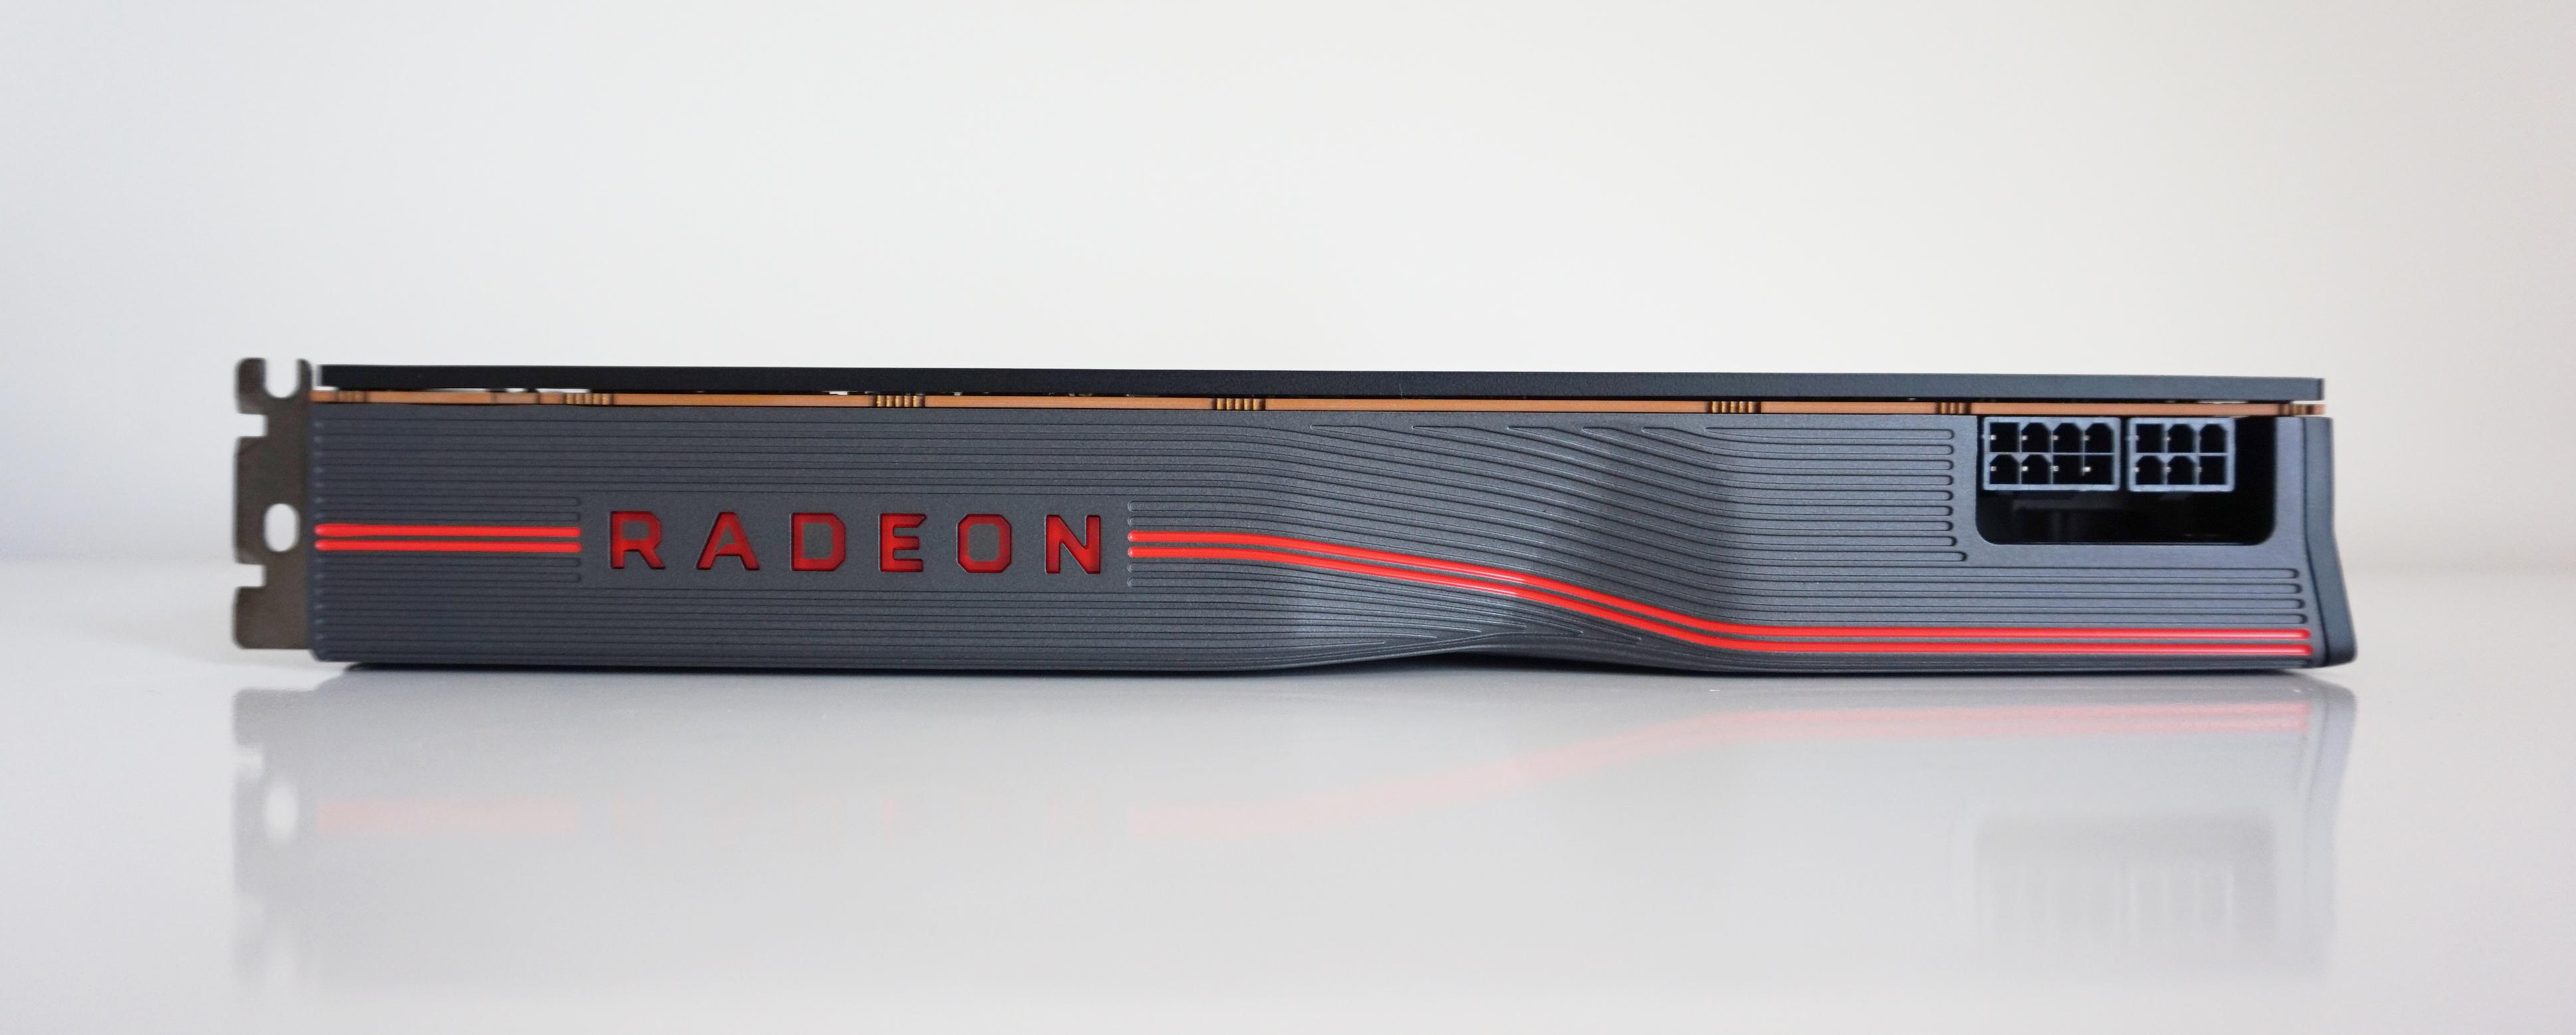 AMD Radeon RX 5700 XT review   Rock Paper Shotgun